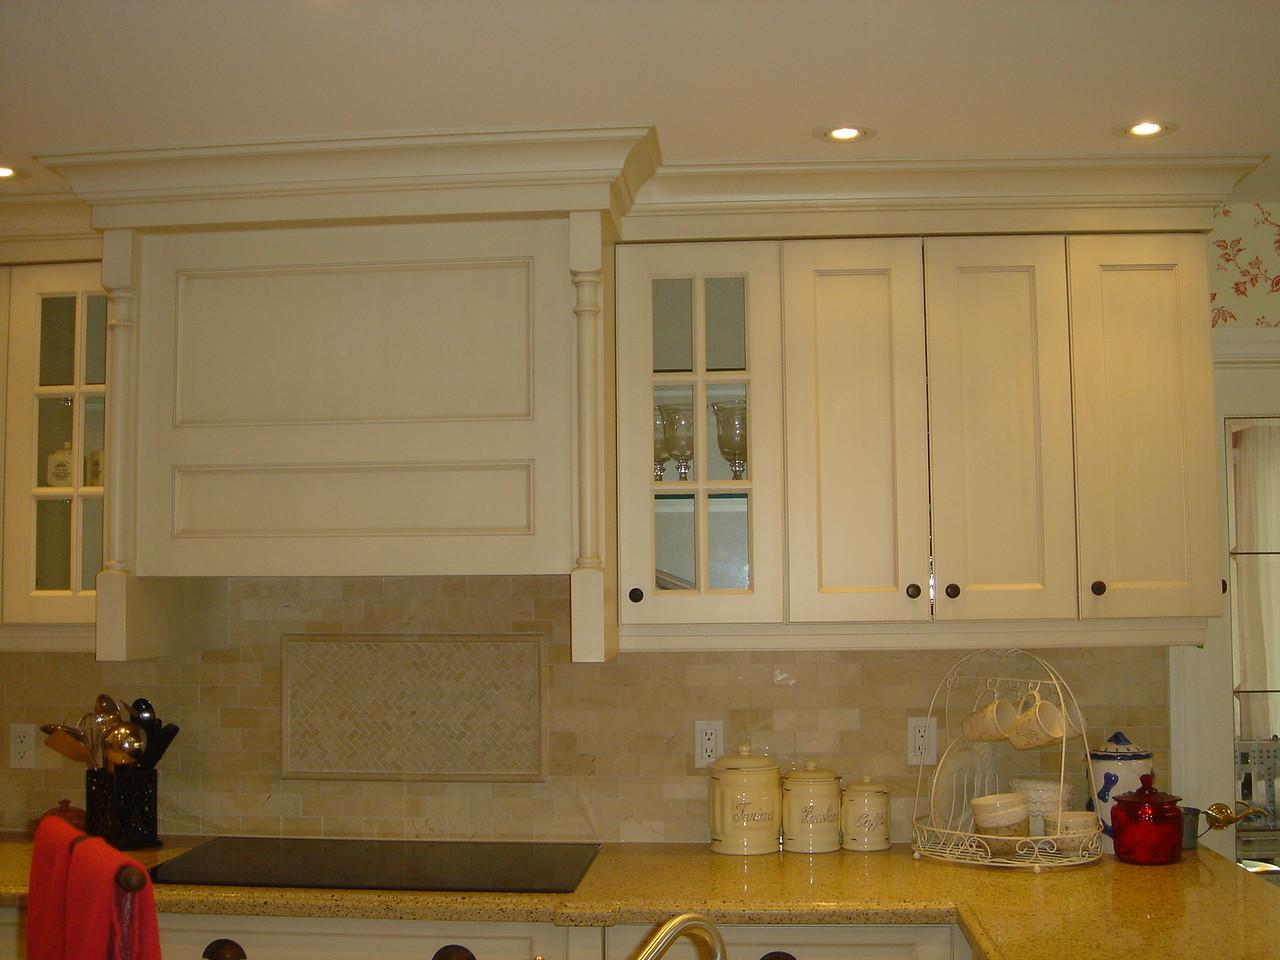 Cooktop and upper cupboards